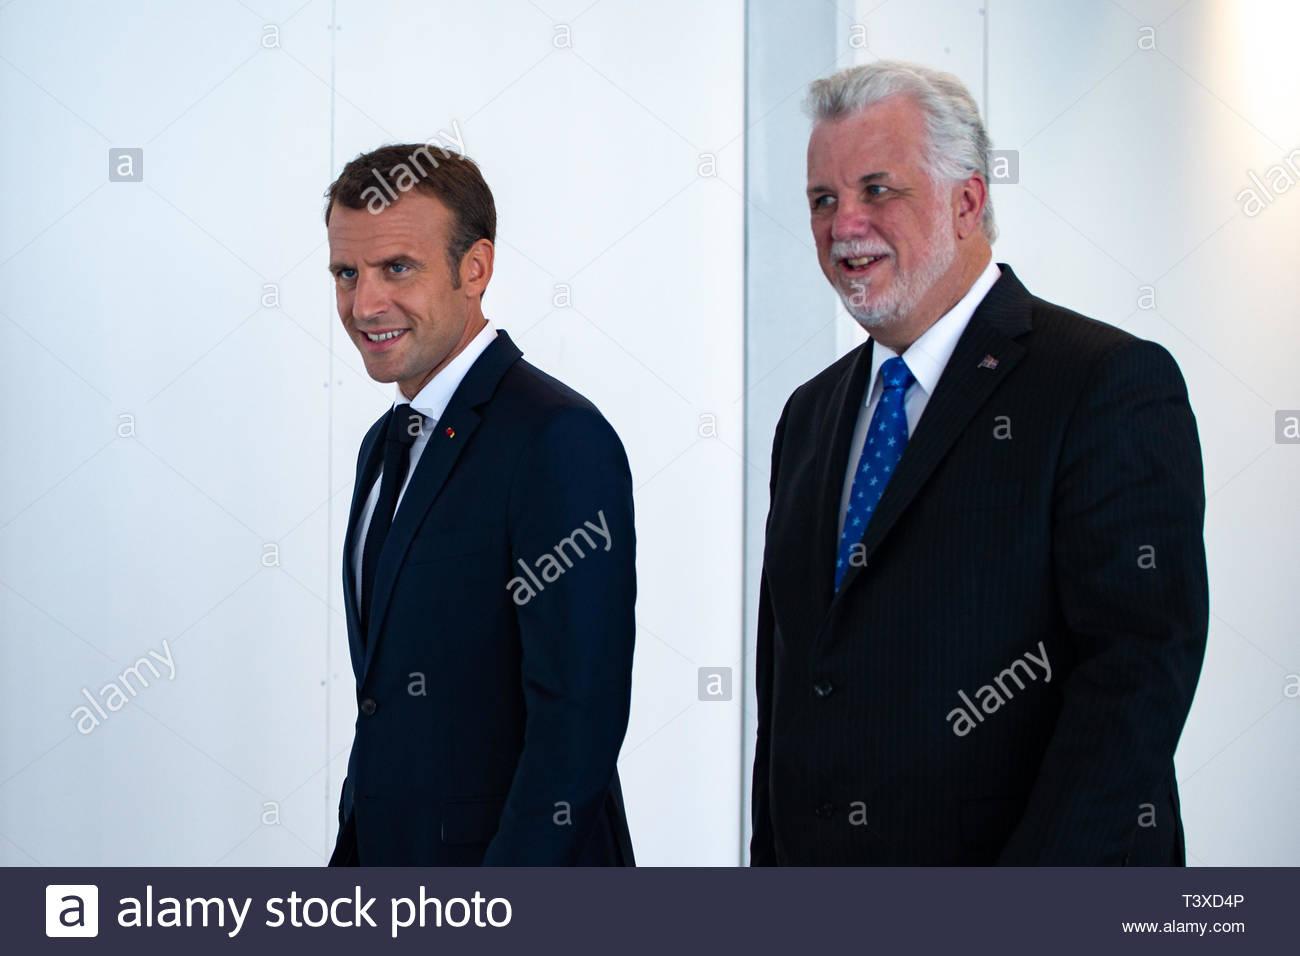 Emmanuel Macron Wedding.Emmanuel Macron Wedding Stock Photos Emmanuel Macron Wedding Stock